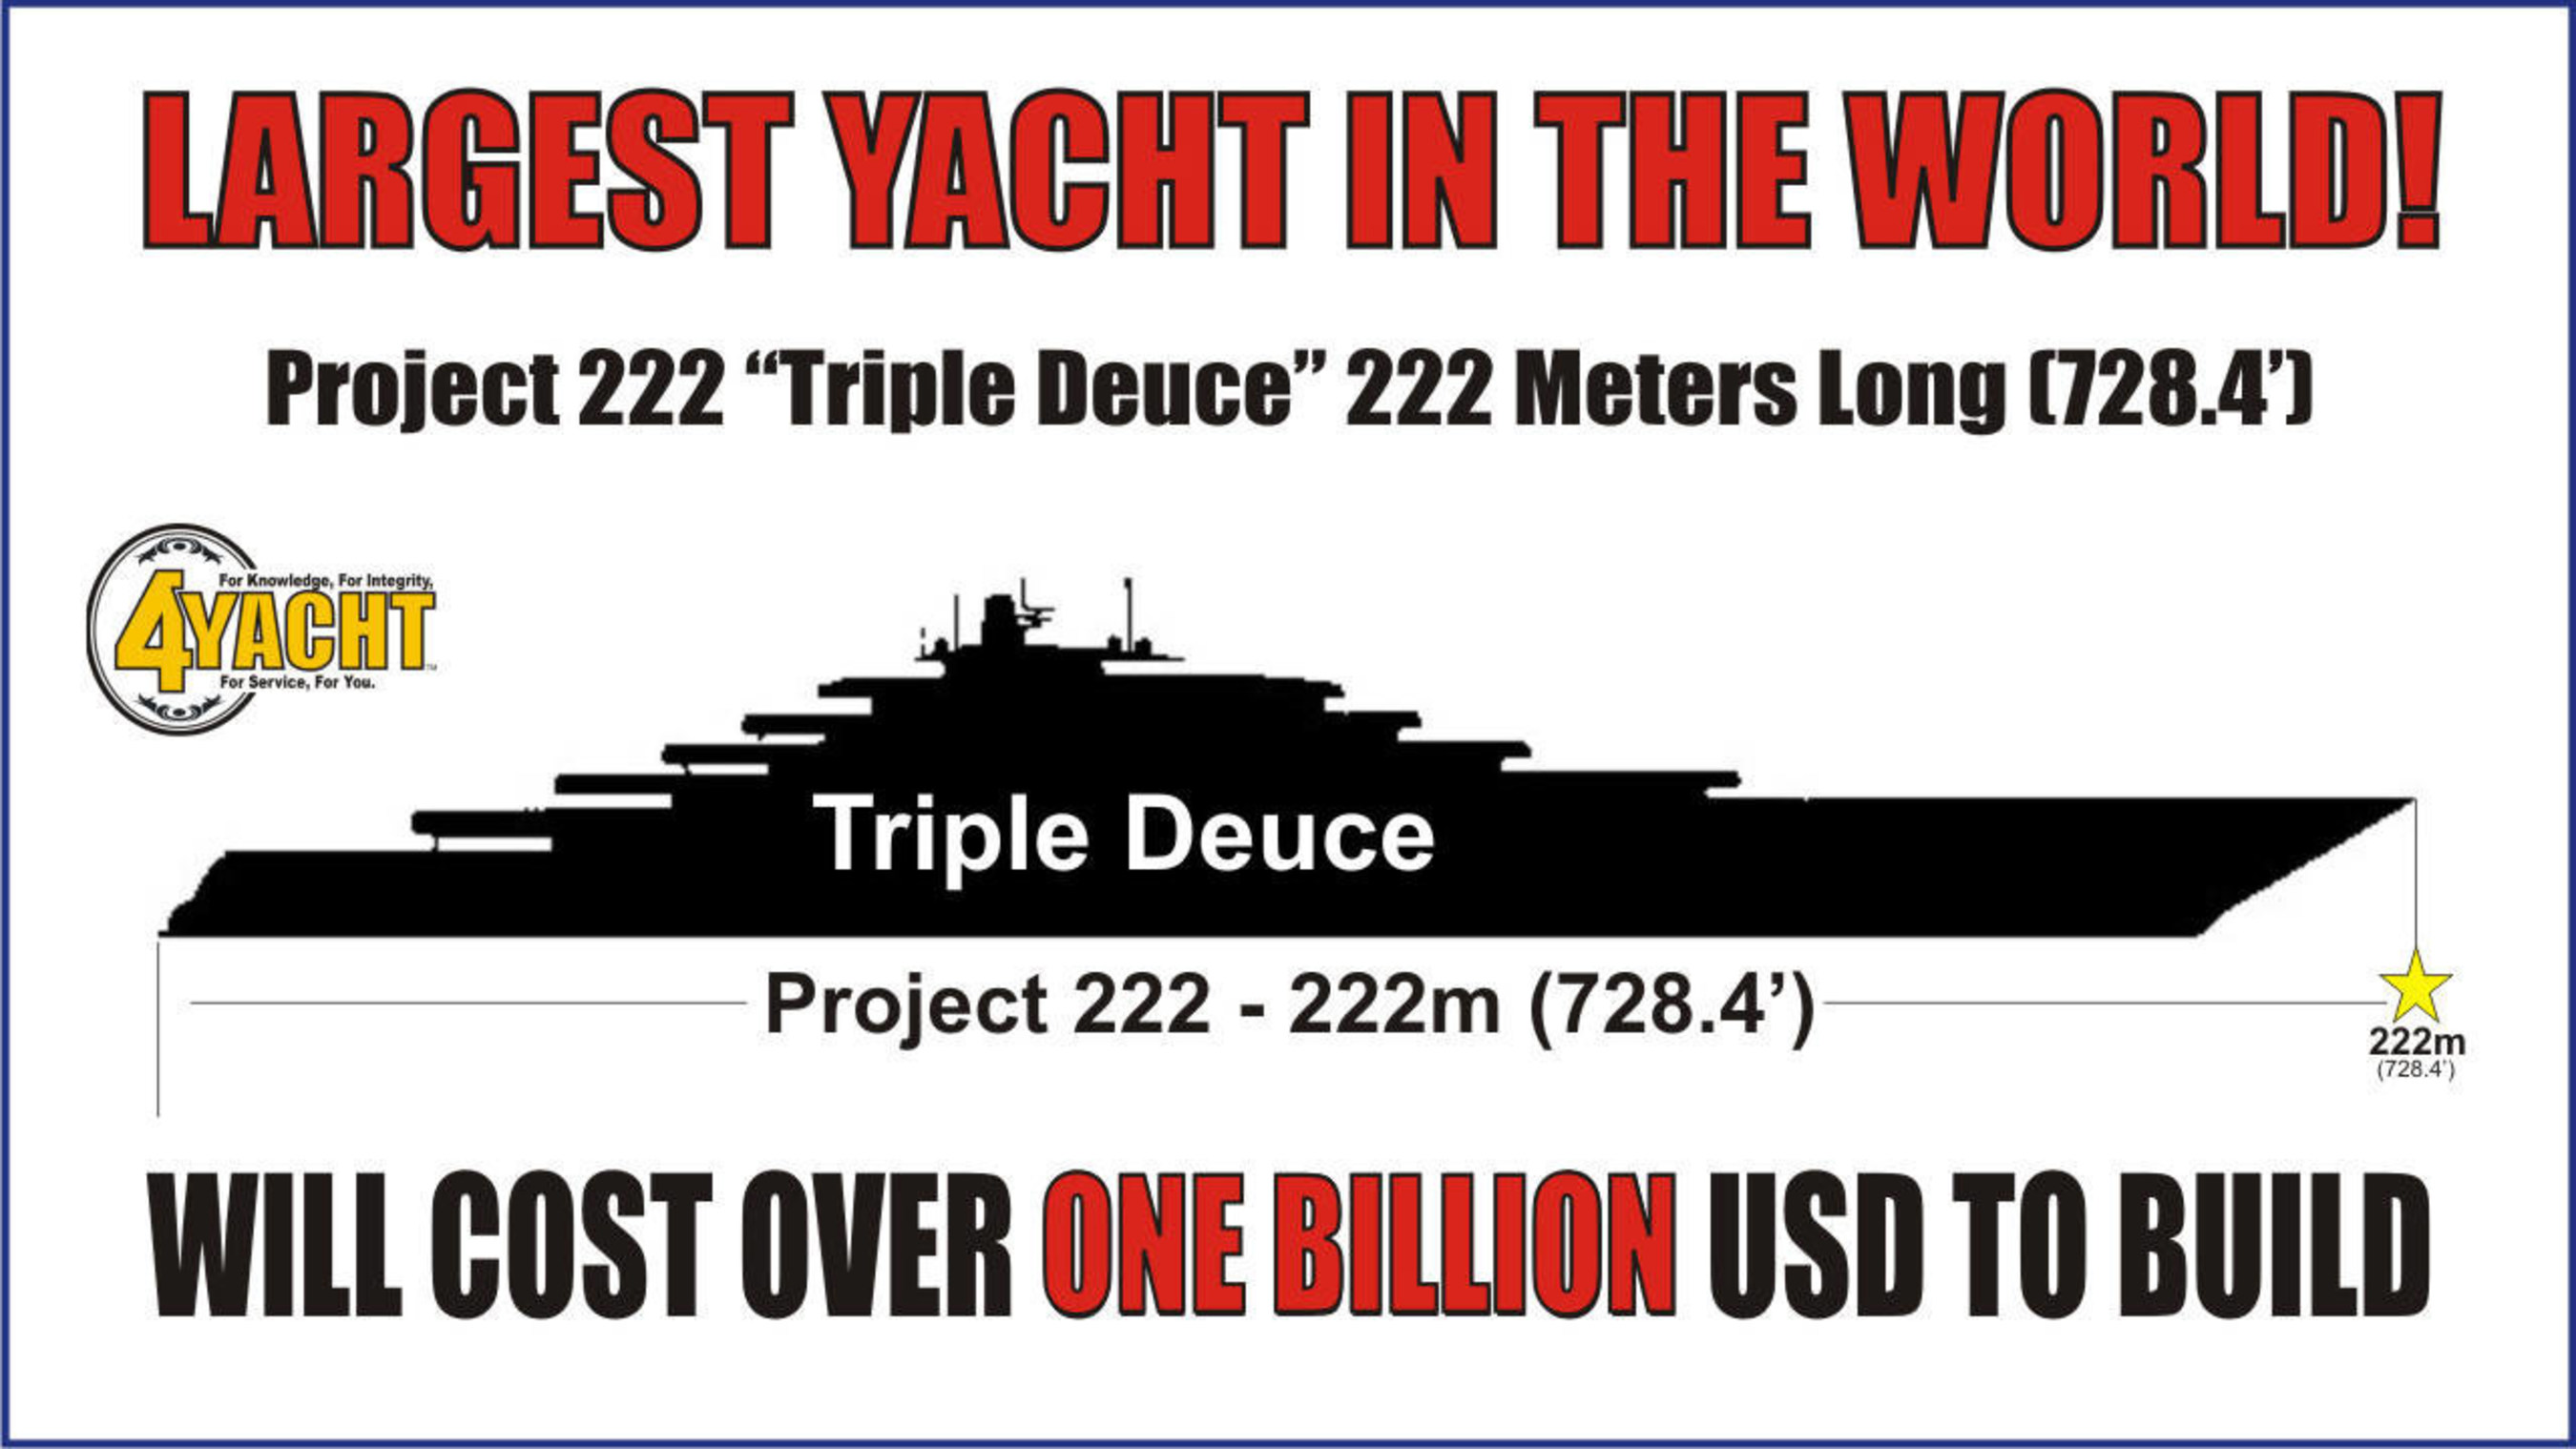 The World's First Billion Dollar Yacht: 222 Meters (728.4') (PRNewsFoto/4Yacht, Inc.)